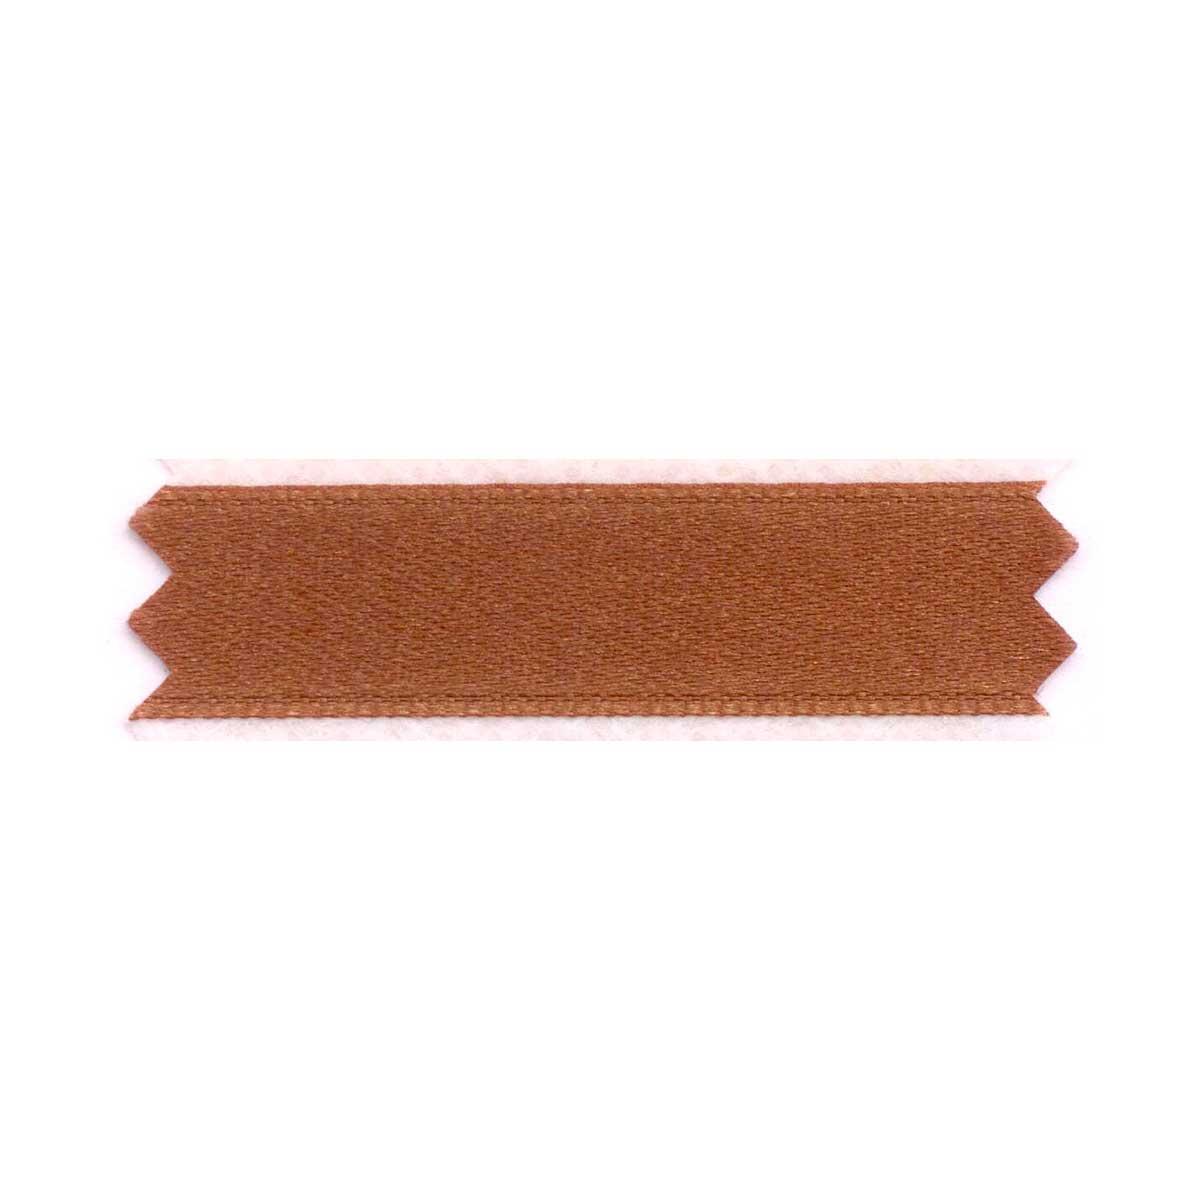 501-15-951 PERRAMON&BADIA Лента сатиновая 15 мм